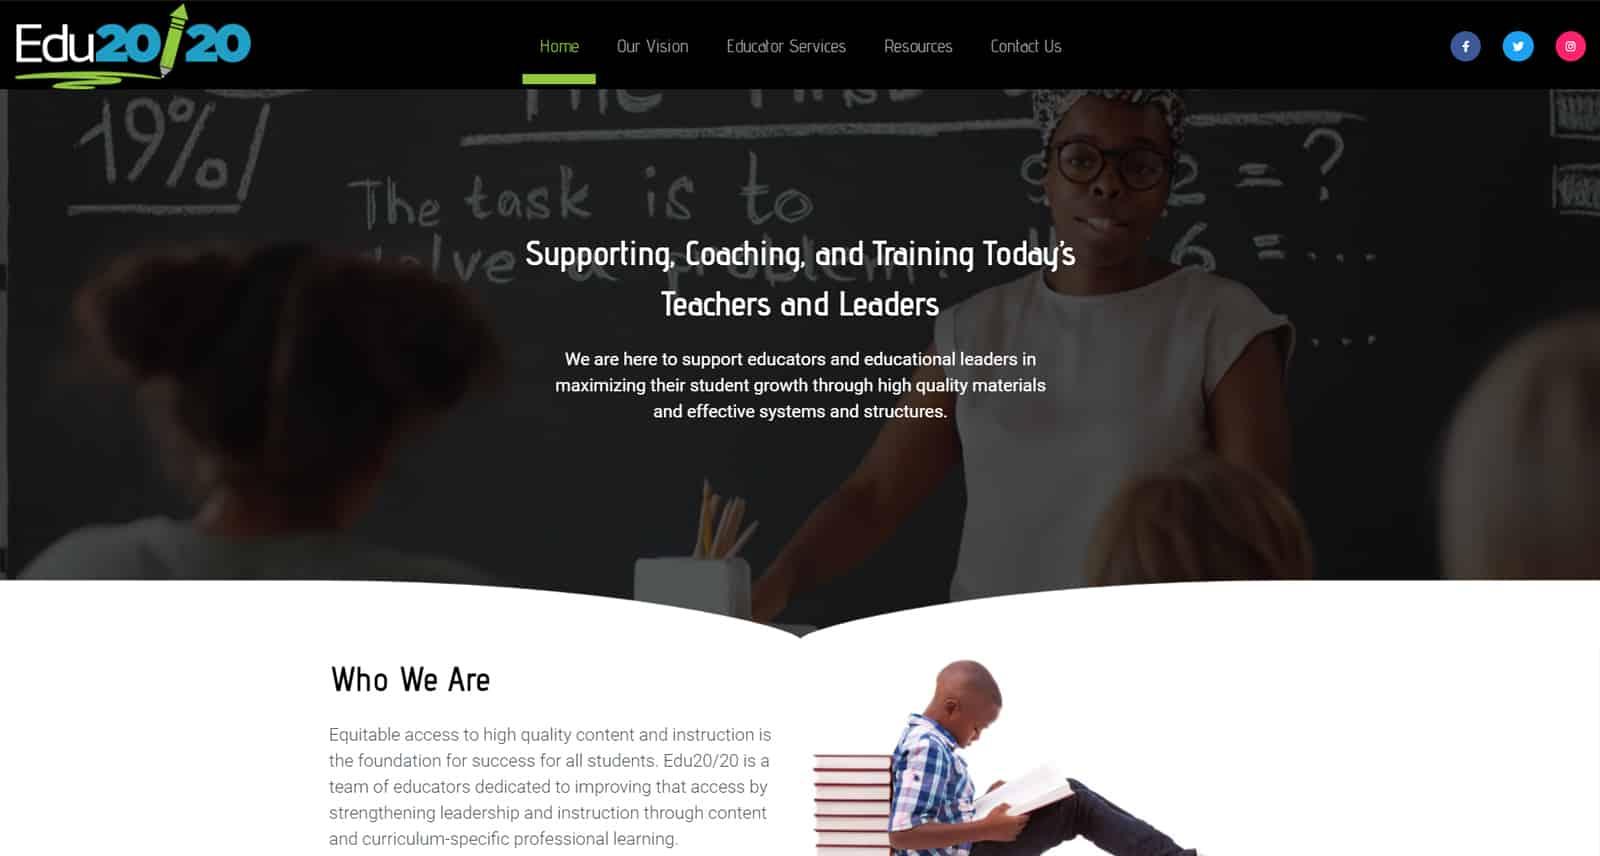 EDU20/20 Website After